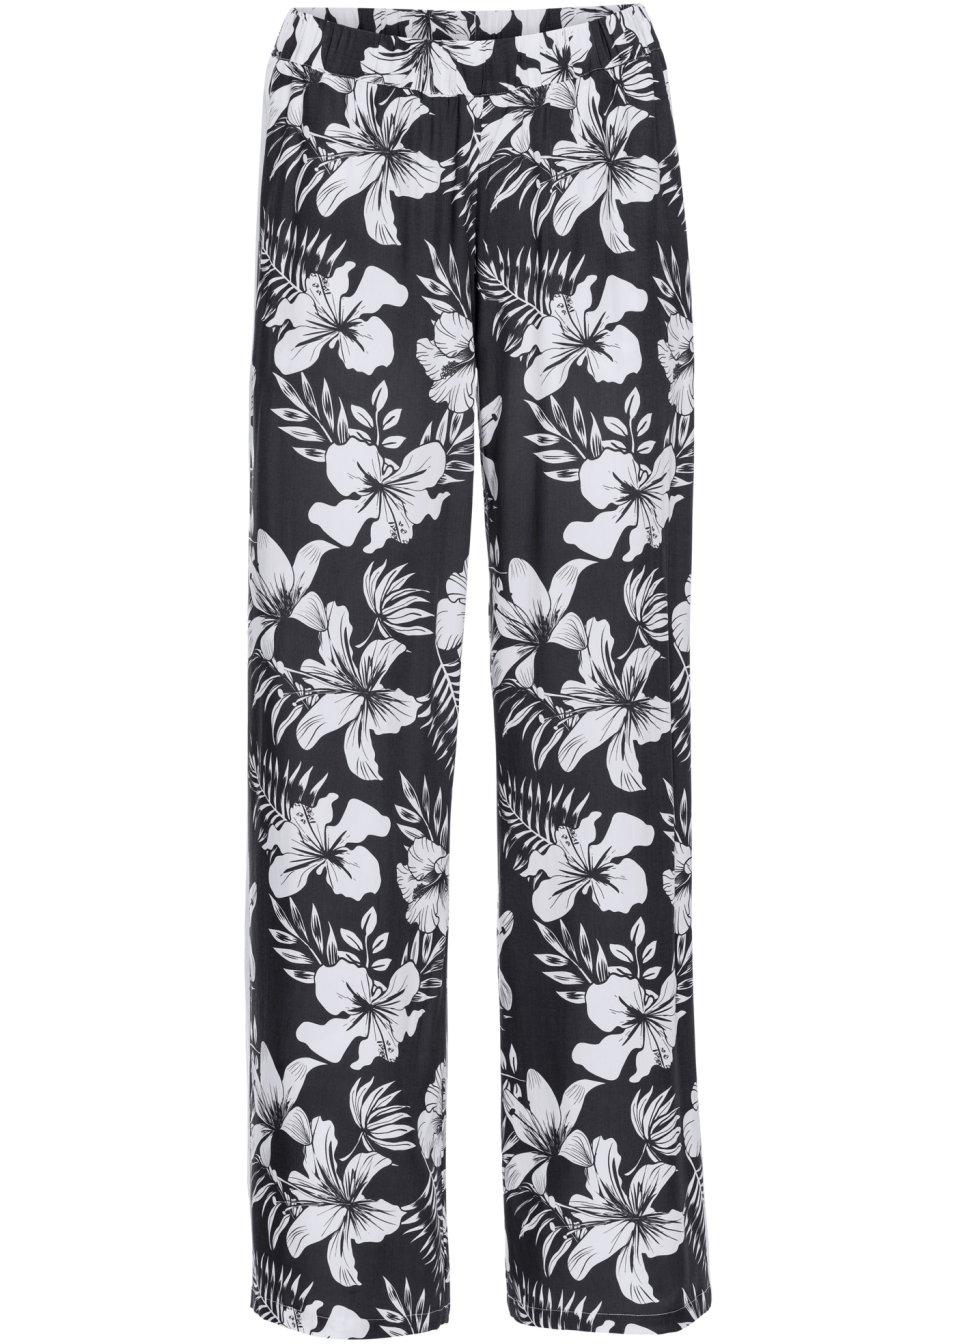 pantalon ample noir blanc imprim femme bodyflirt bonprix. Black Bedroom Furniture Sets. Home Design Ideas